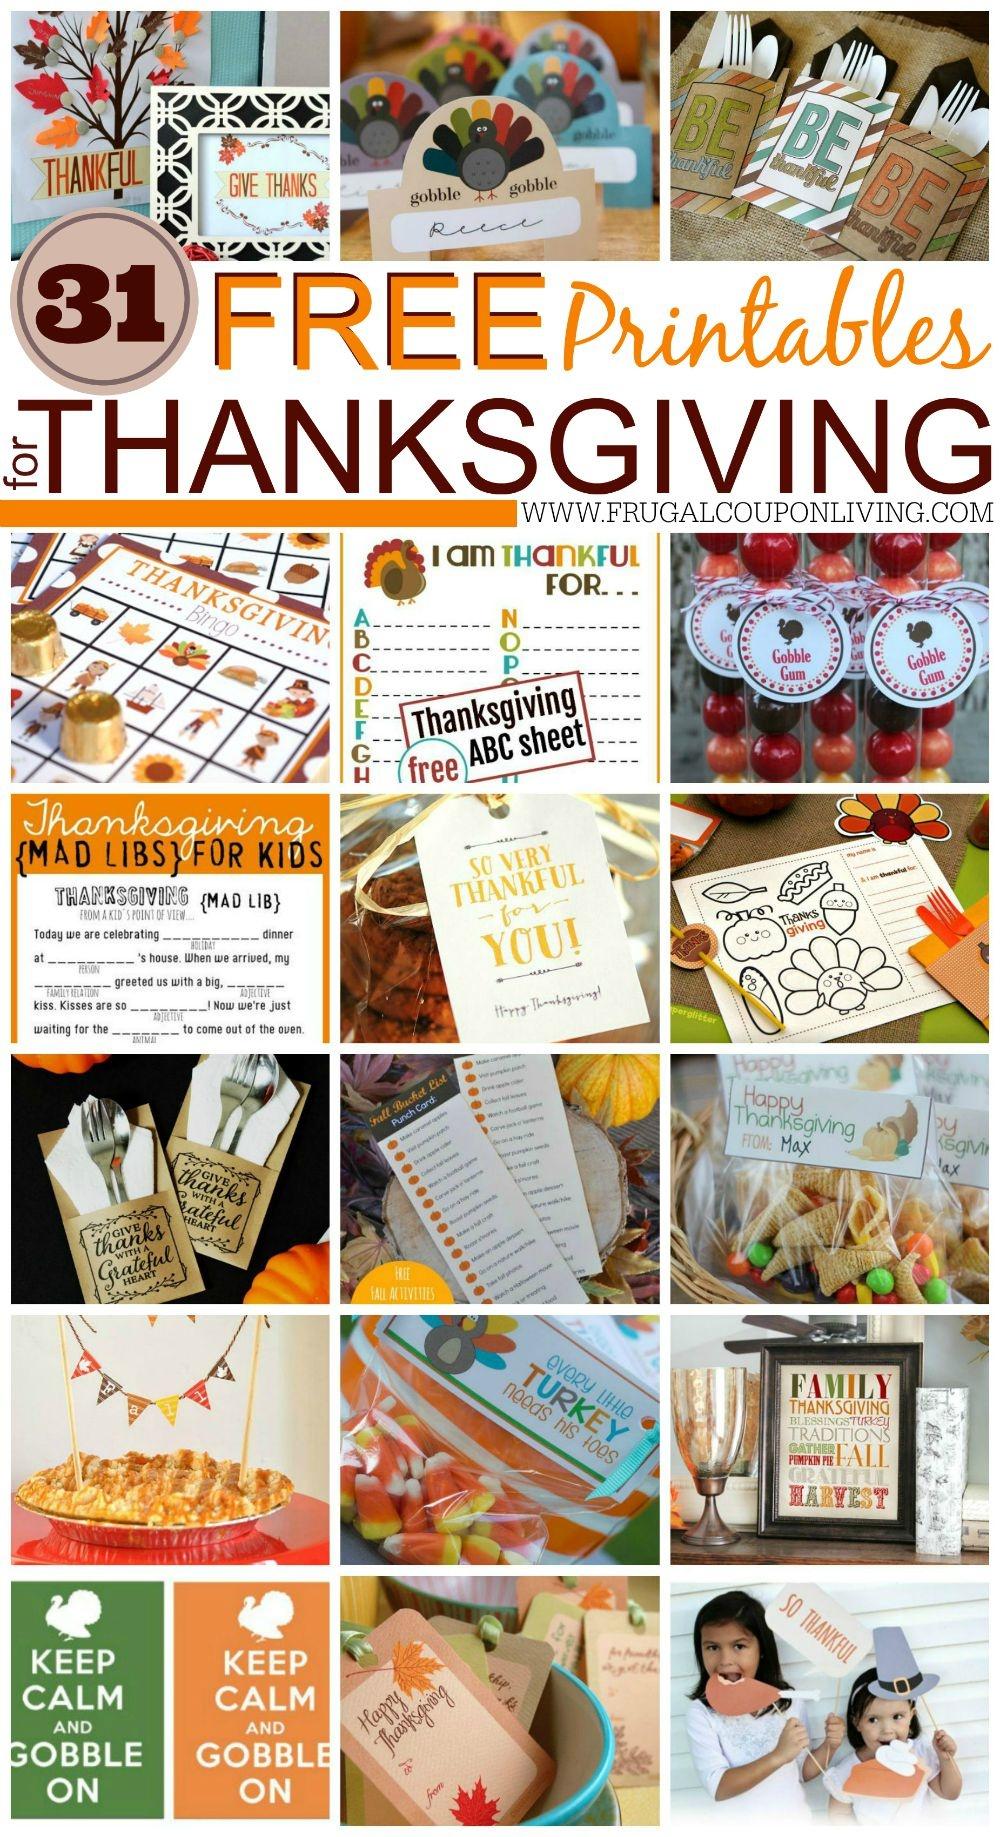 31 Free Thanksgiving Printables - Free Printable Thanksgiving Treat Bag Toppers